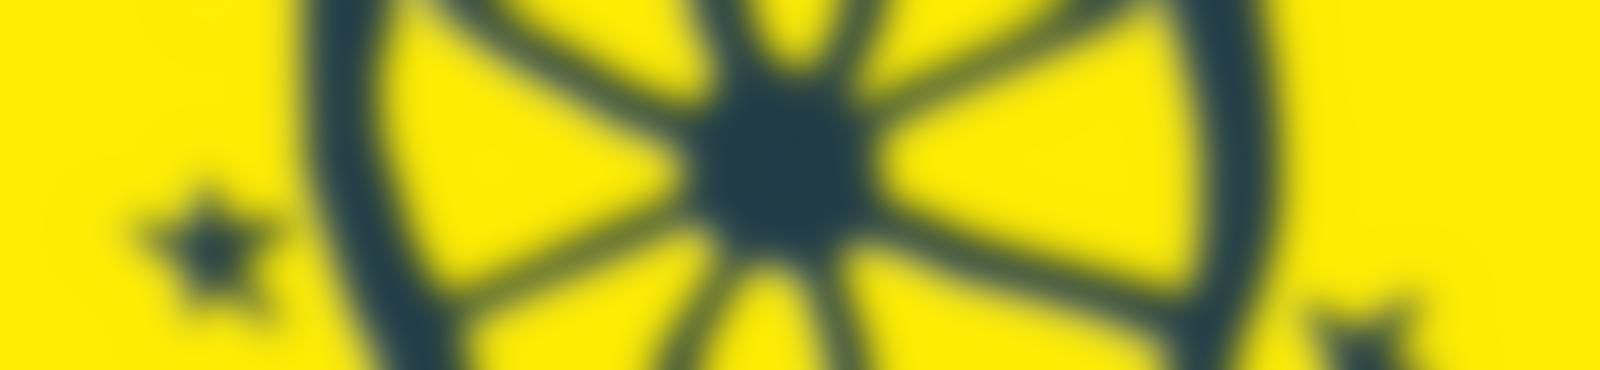 Blurred f0e6c604 56ec 41c6 8032 7249f18bdeaf